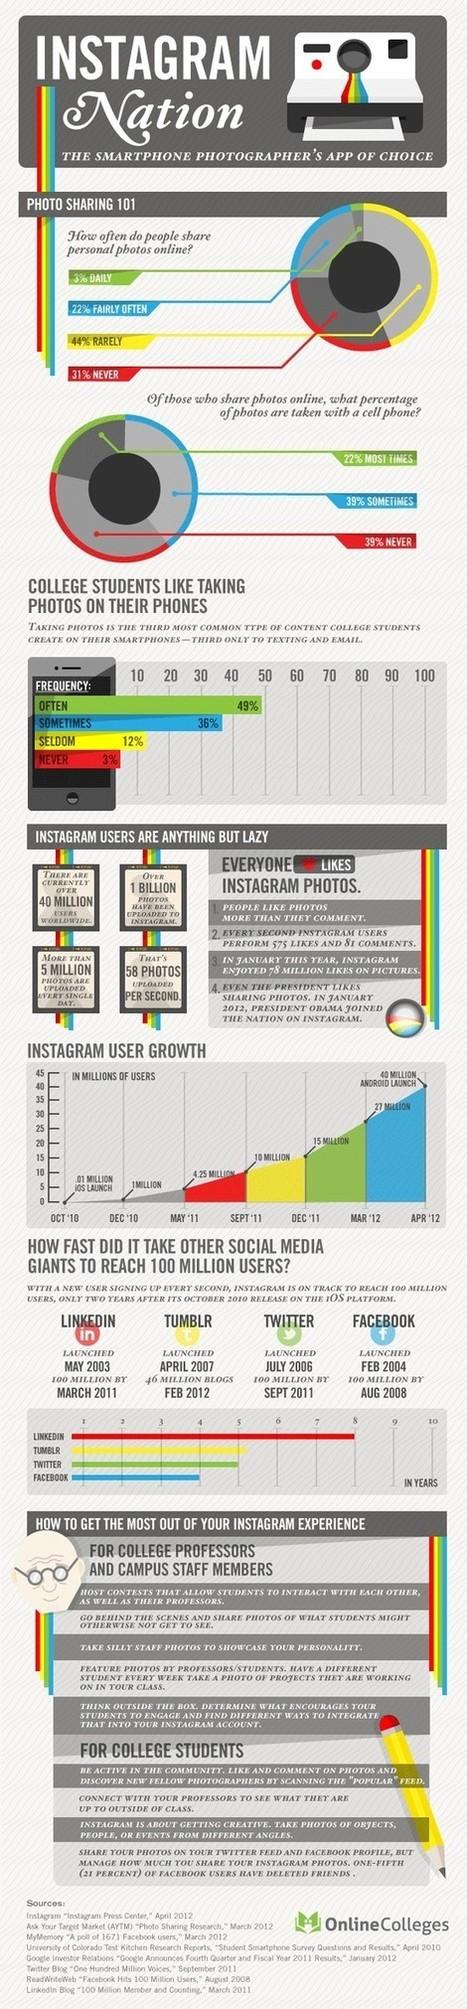 Digital marketing & Social commerce / Instagram Nation infographic ... | Social on the GO!!! | Scoop.it